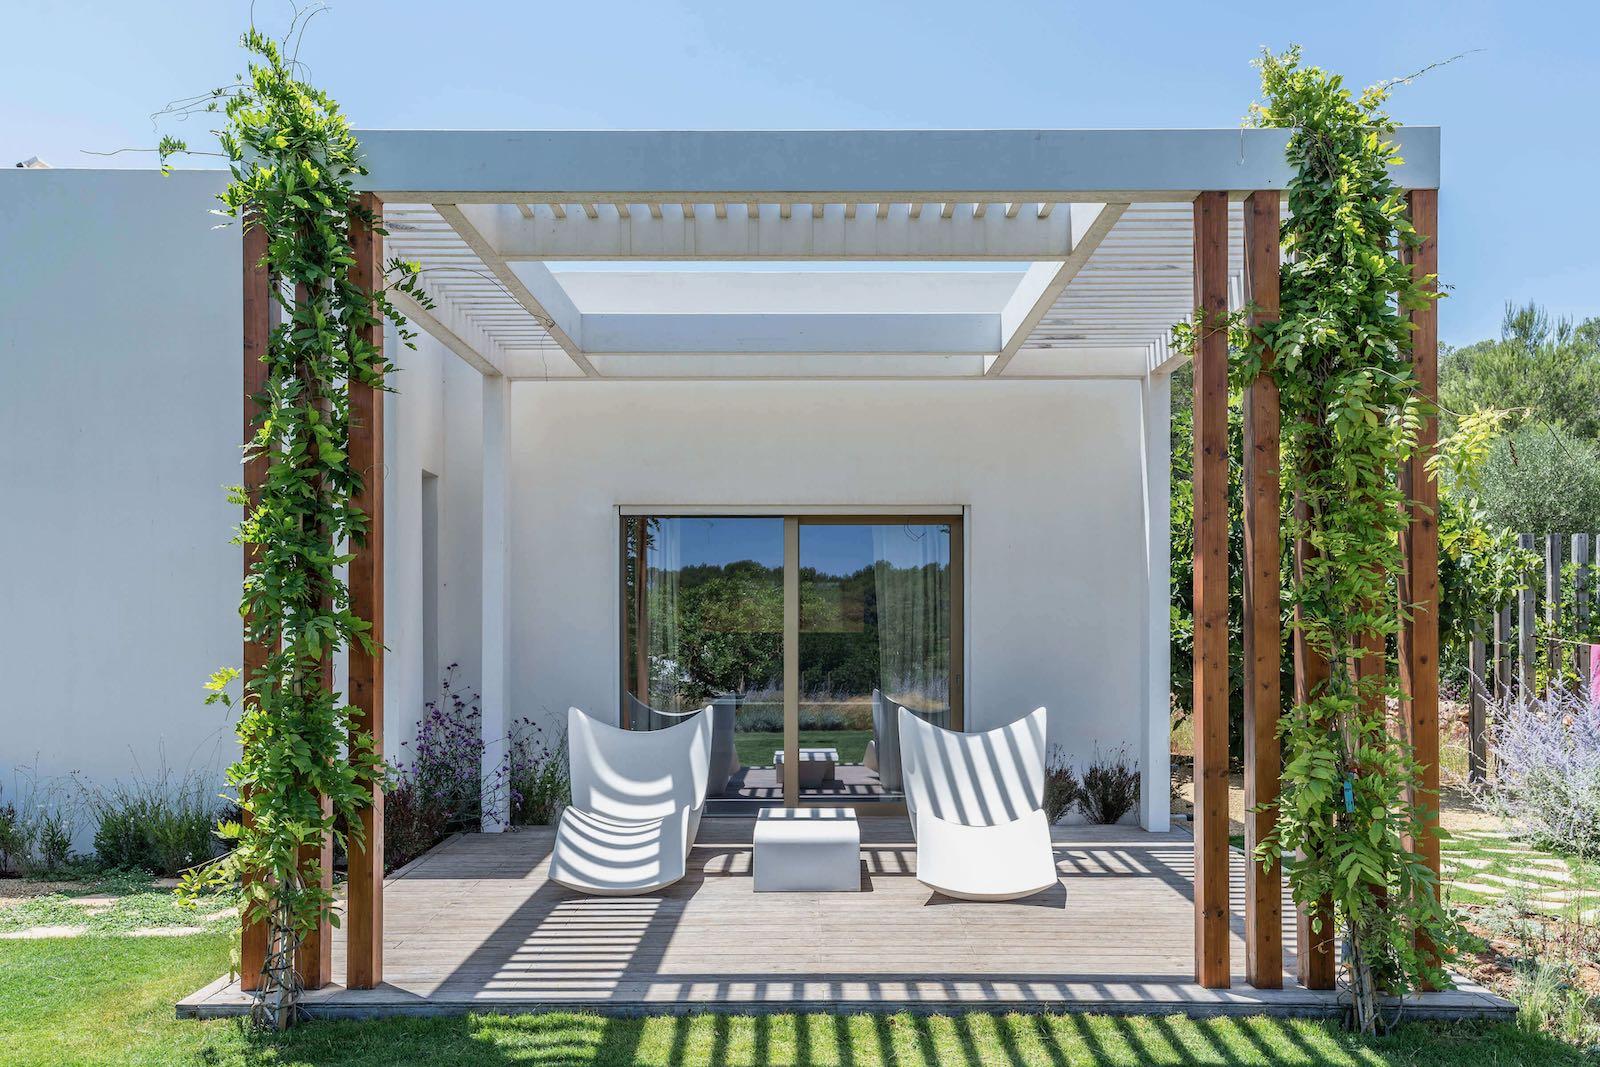 https://www.white-ibiza.com/wp-content/uploads/2021/06/white-ibiza-property-passivhaus-wi1853-31.jpeg